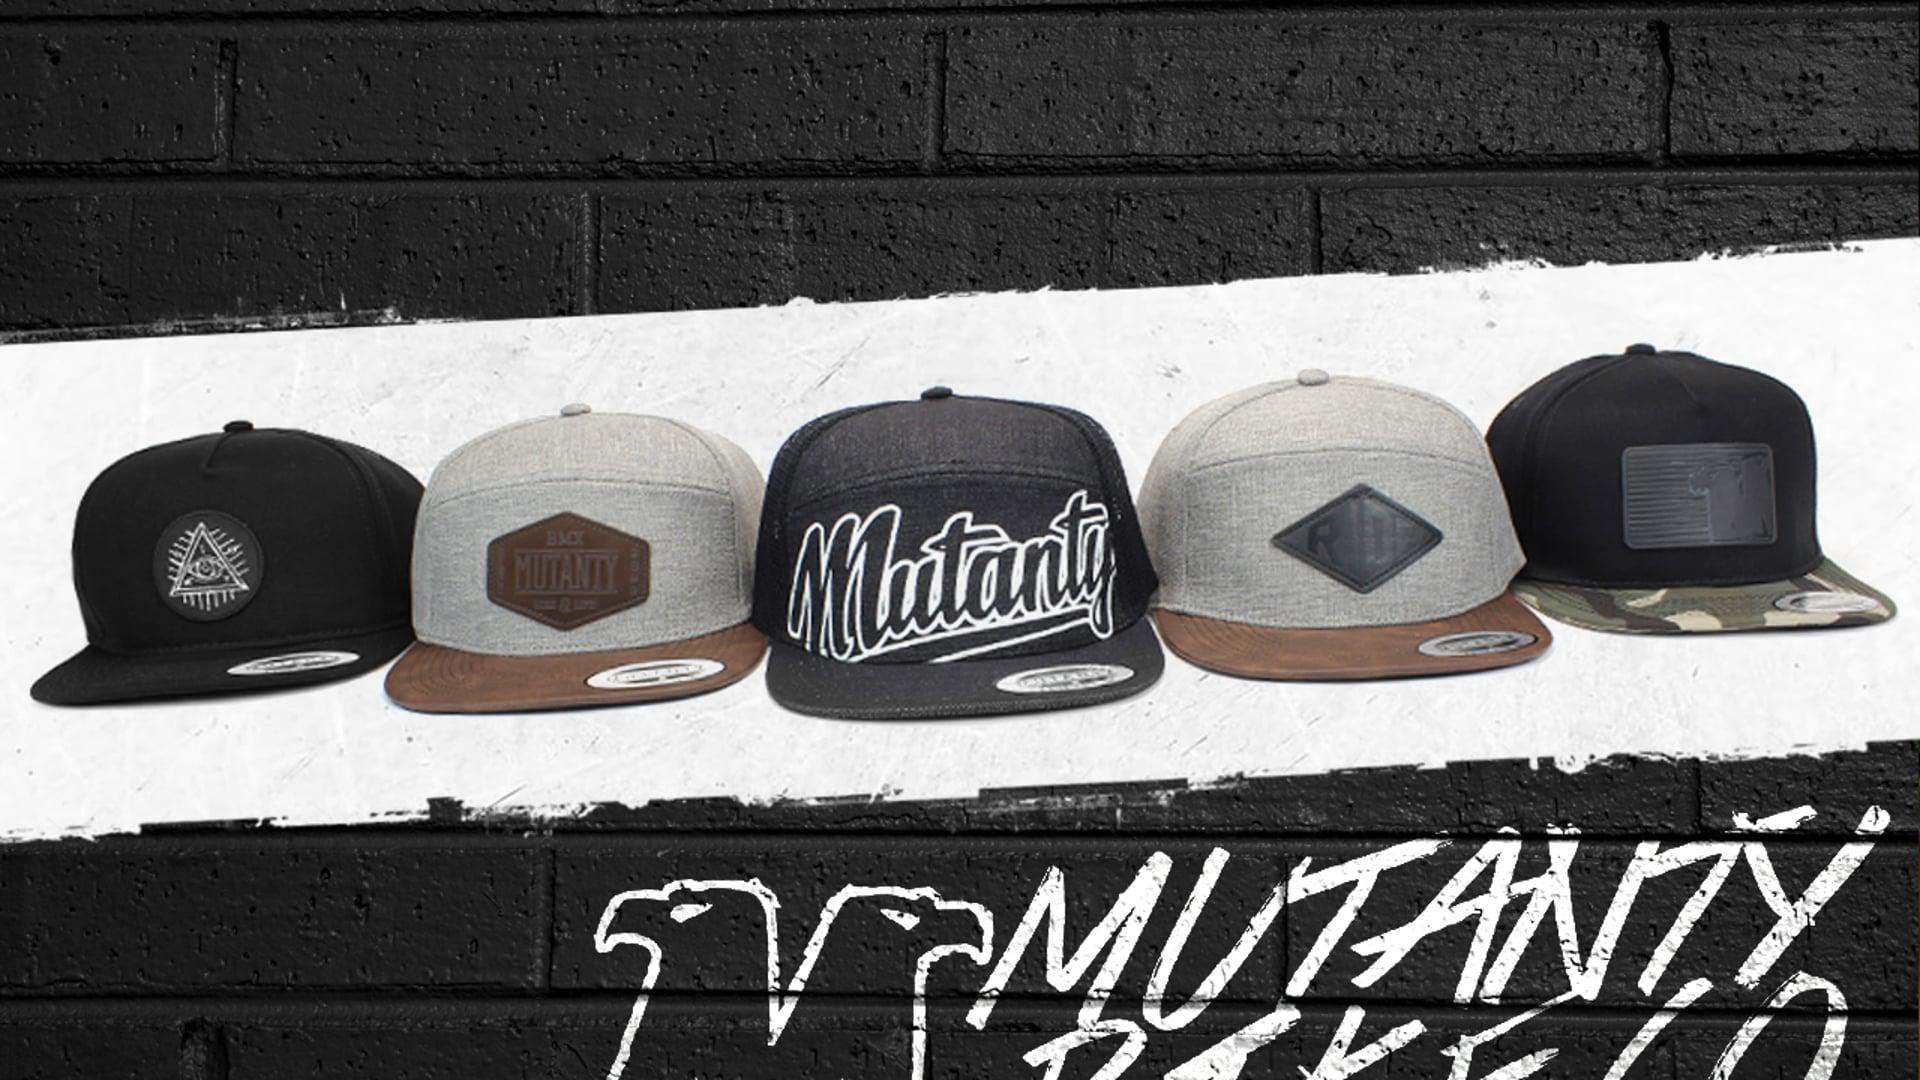 MUTANTY SNAPBACK HATS